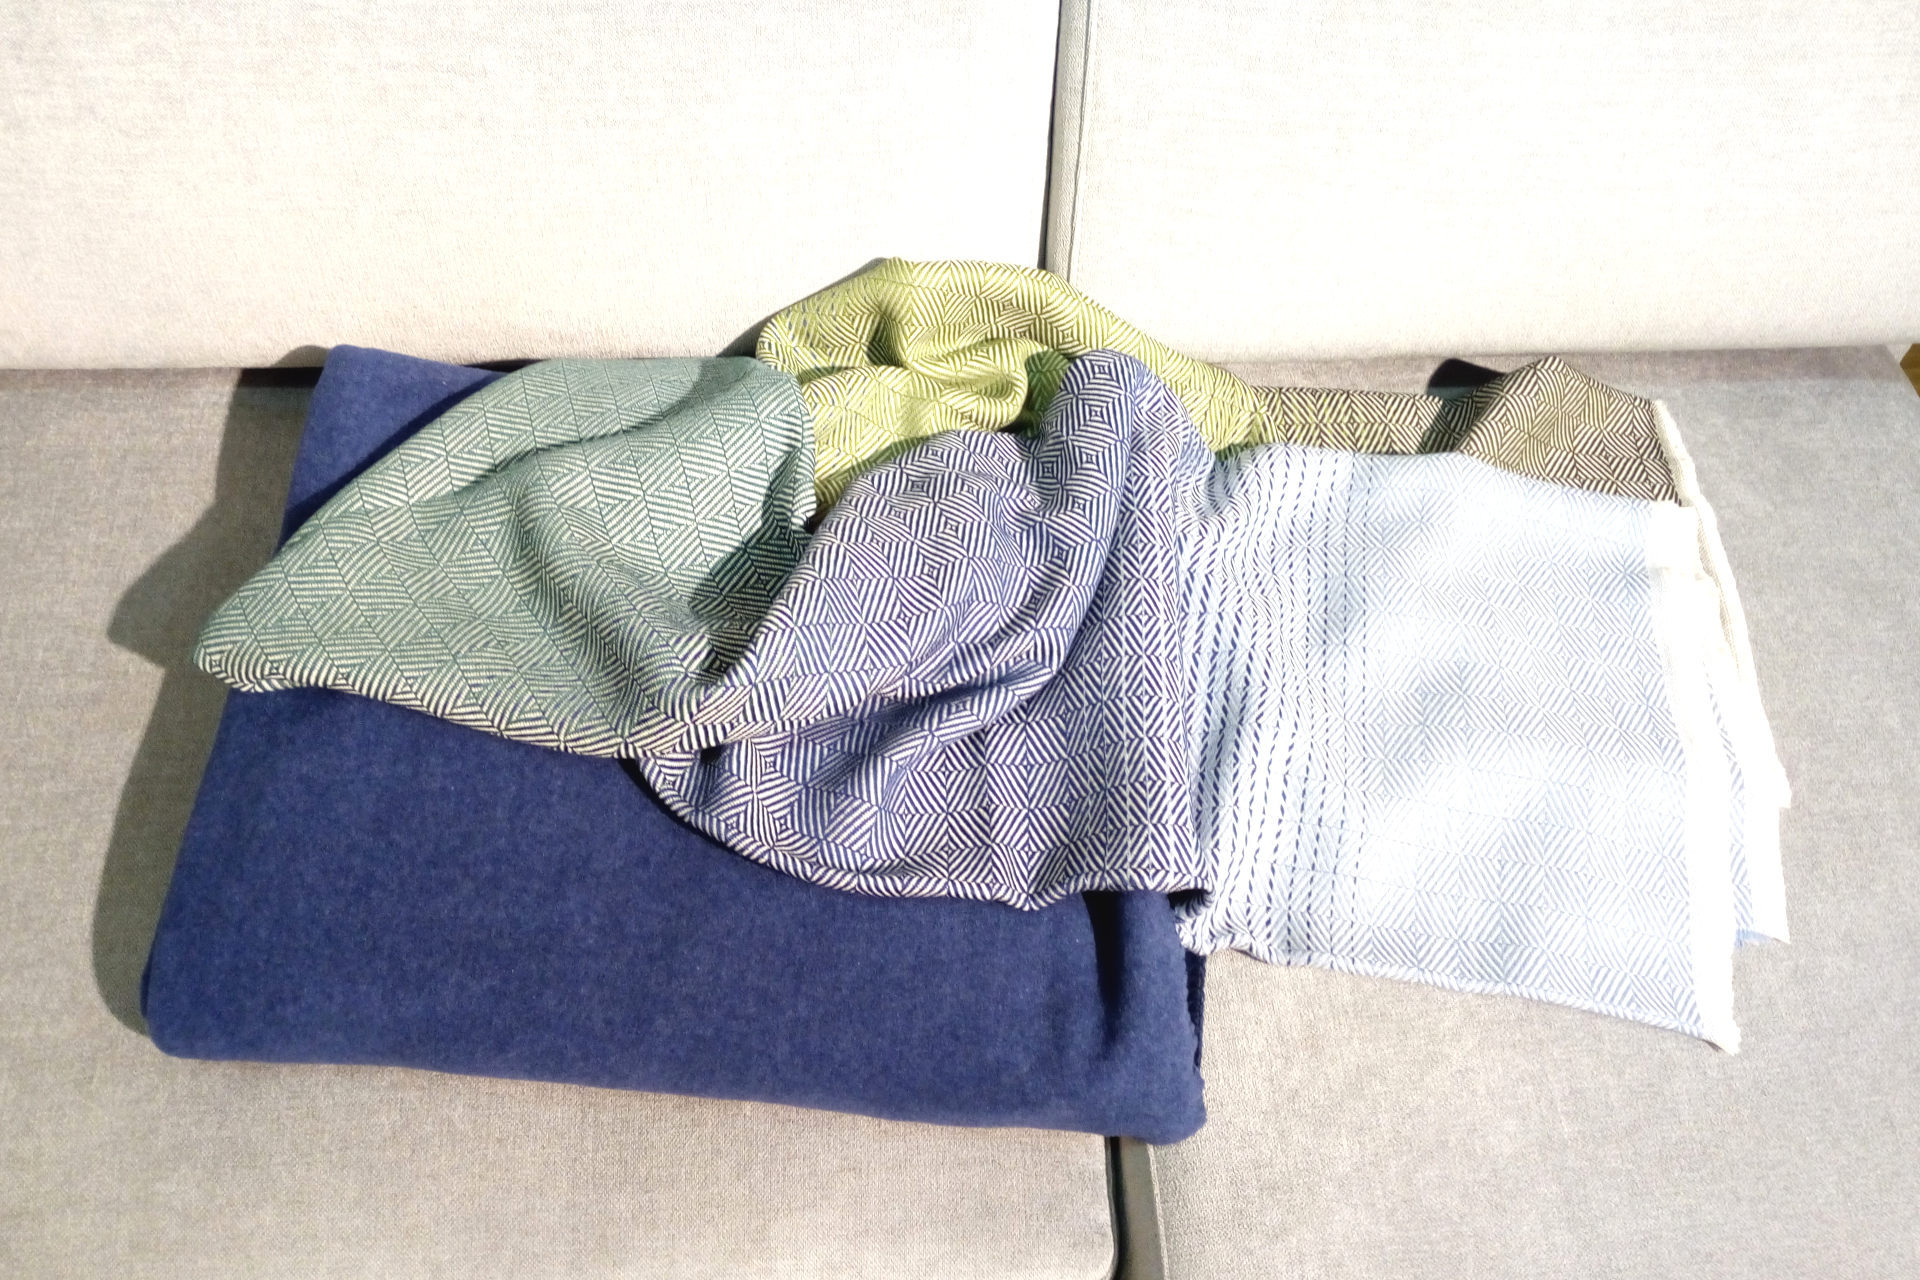 Decken Plaids Home Heimtextilien Frühling Sommer Farben blau grün türkis